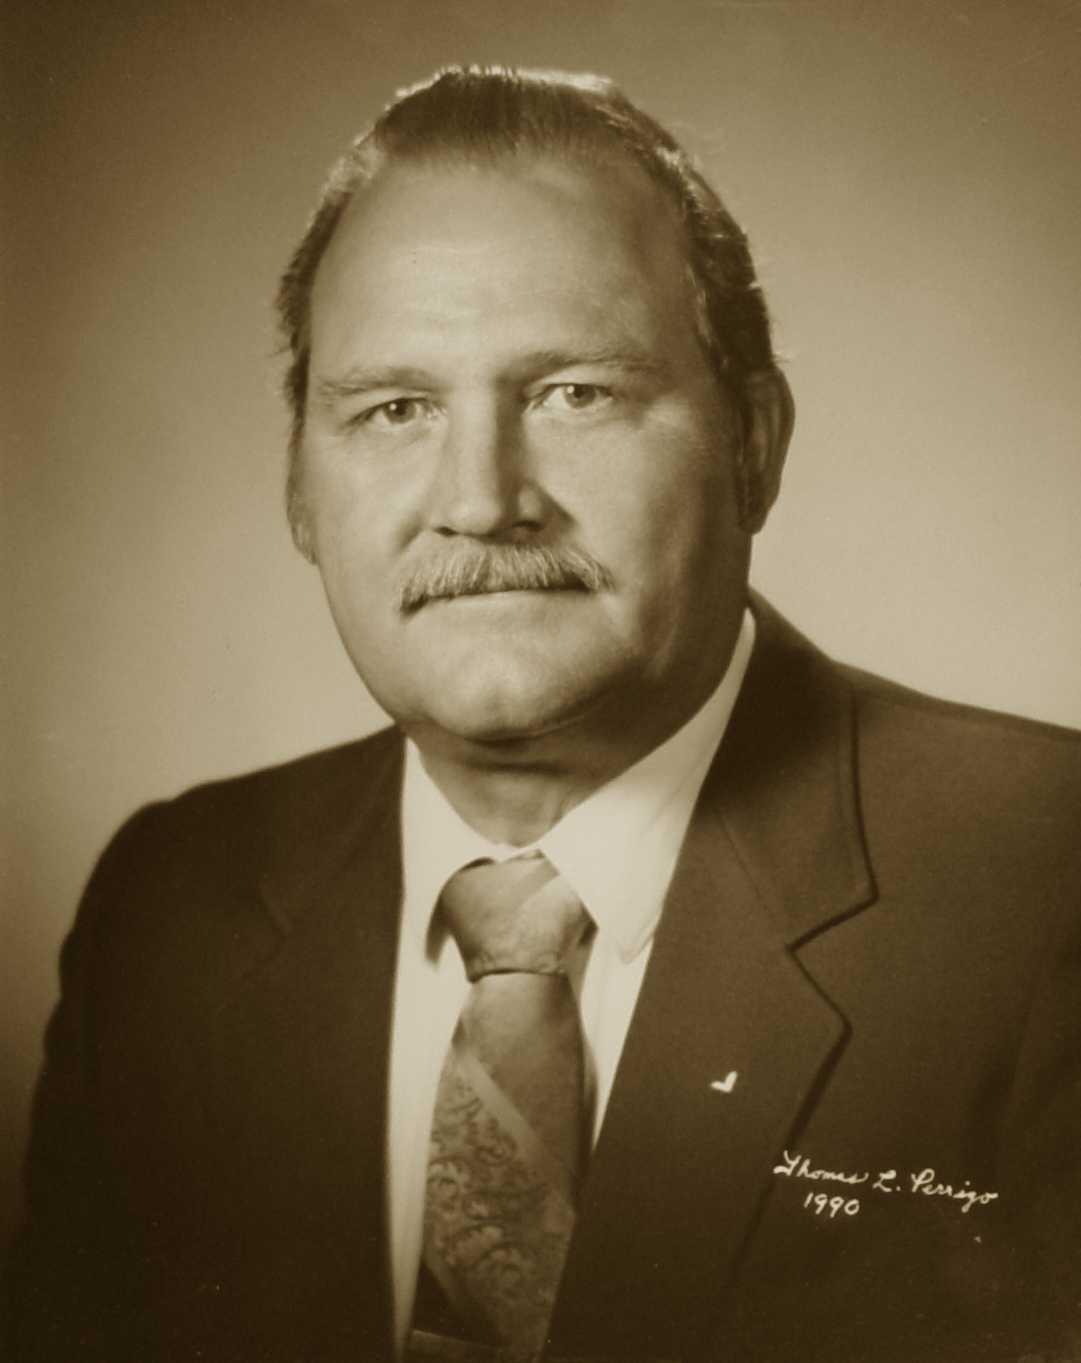 Thomas L. Perrigo, 1990